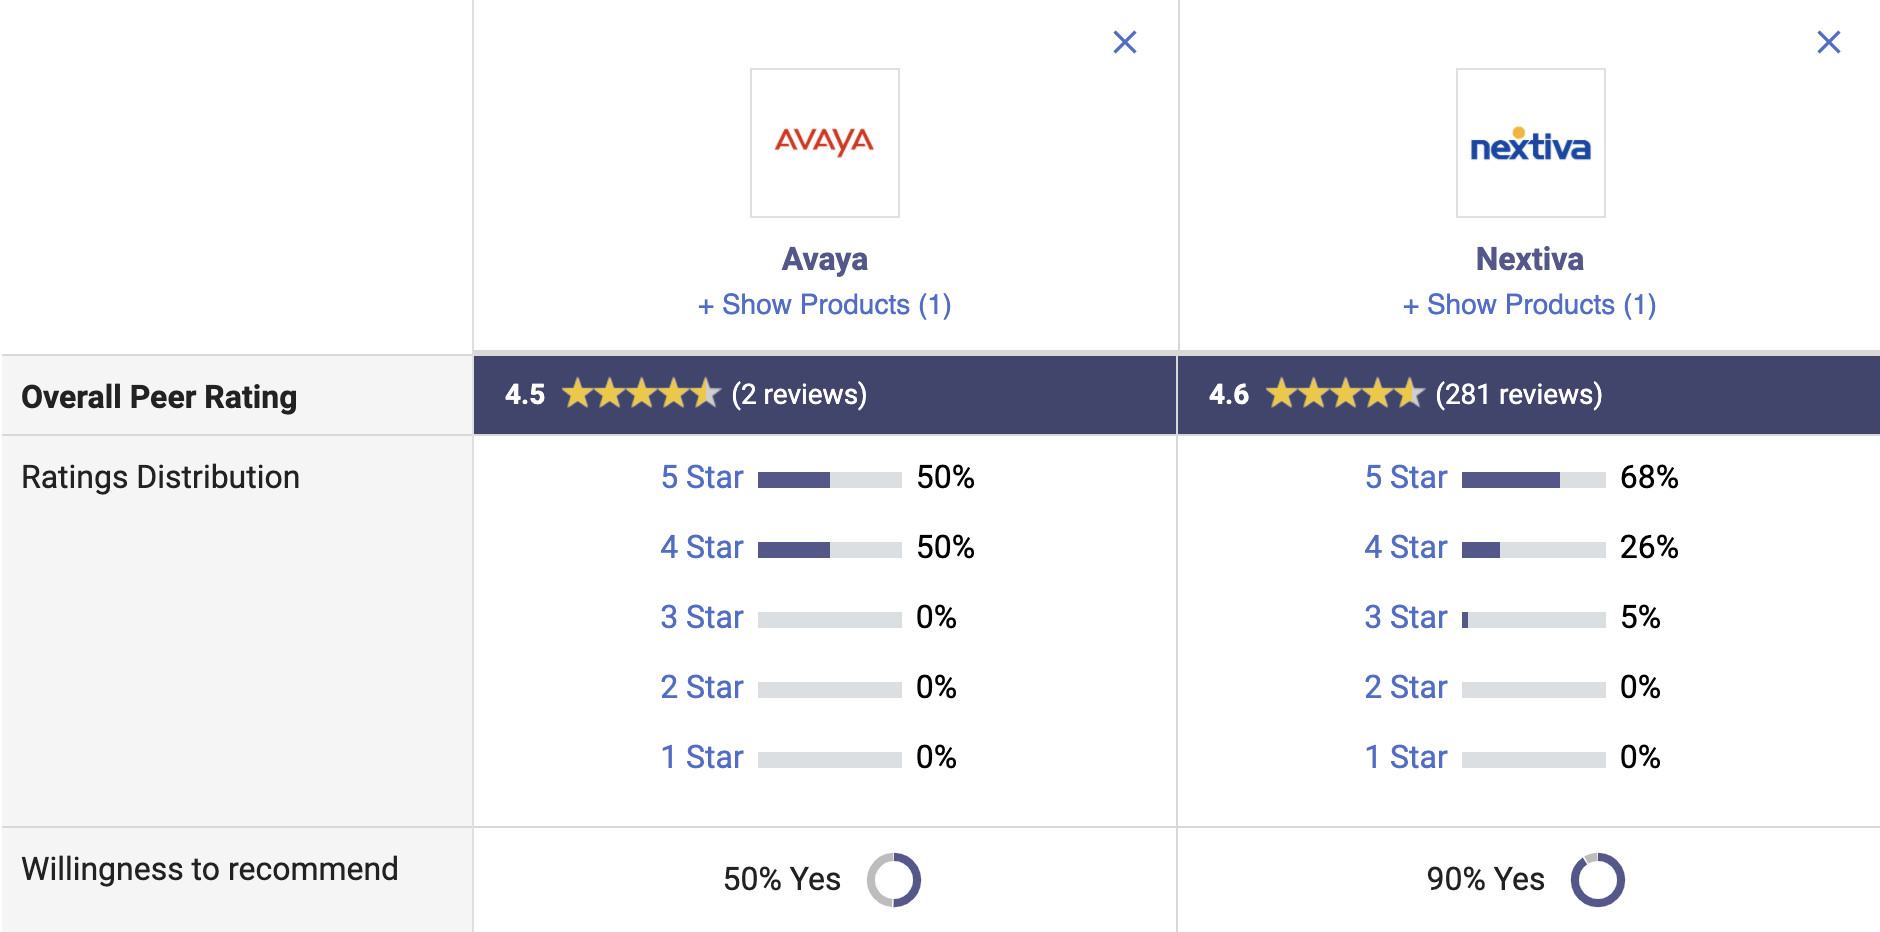 Nextiva vs Avaya on Gartner Peer Insights